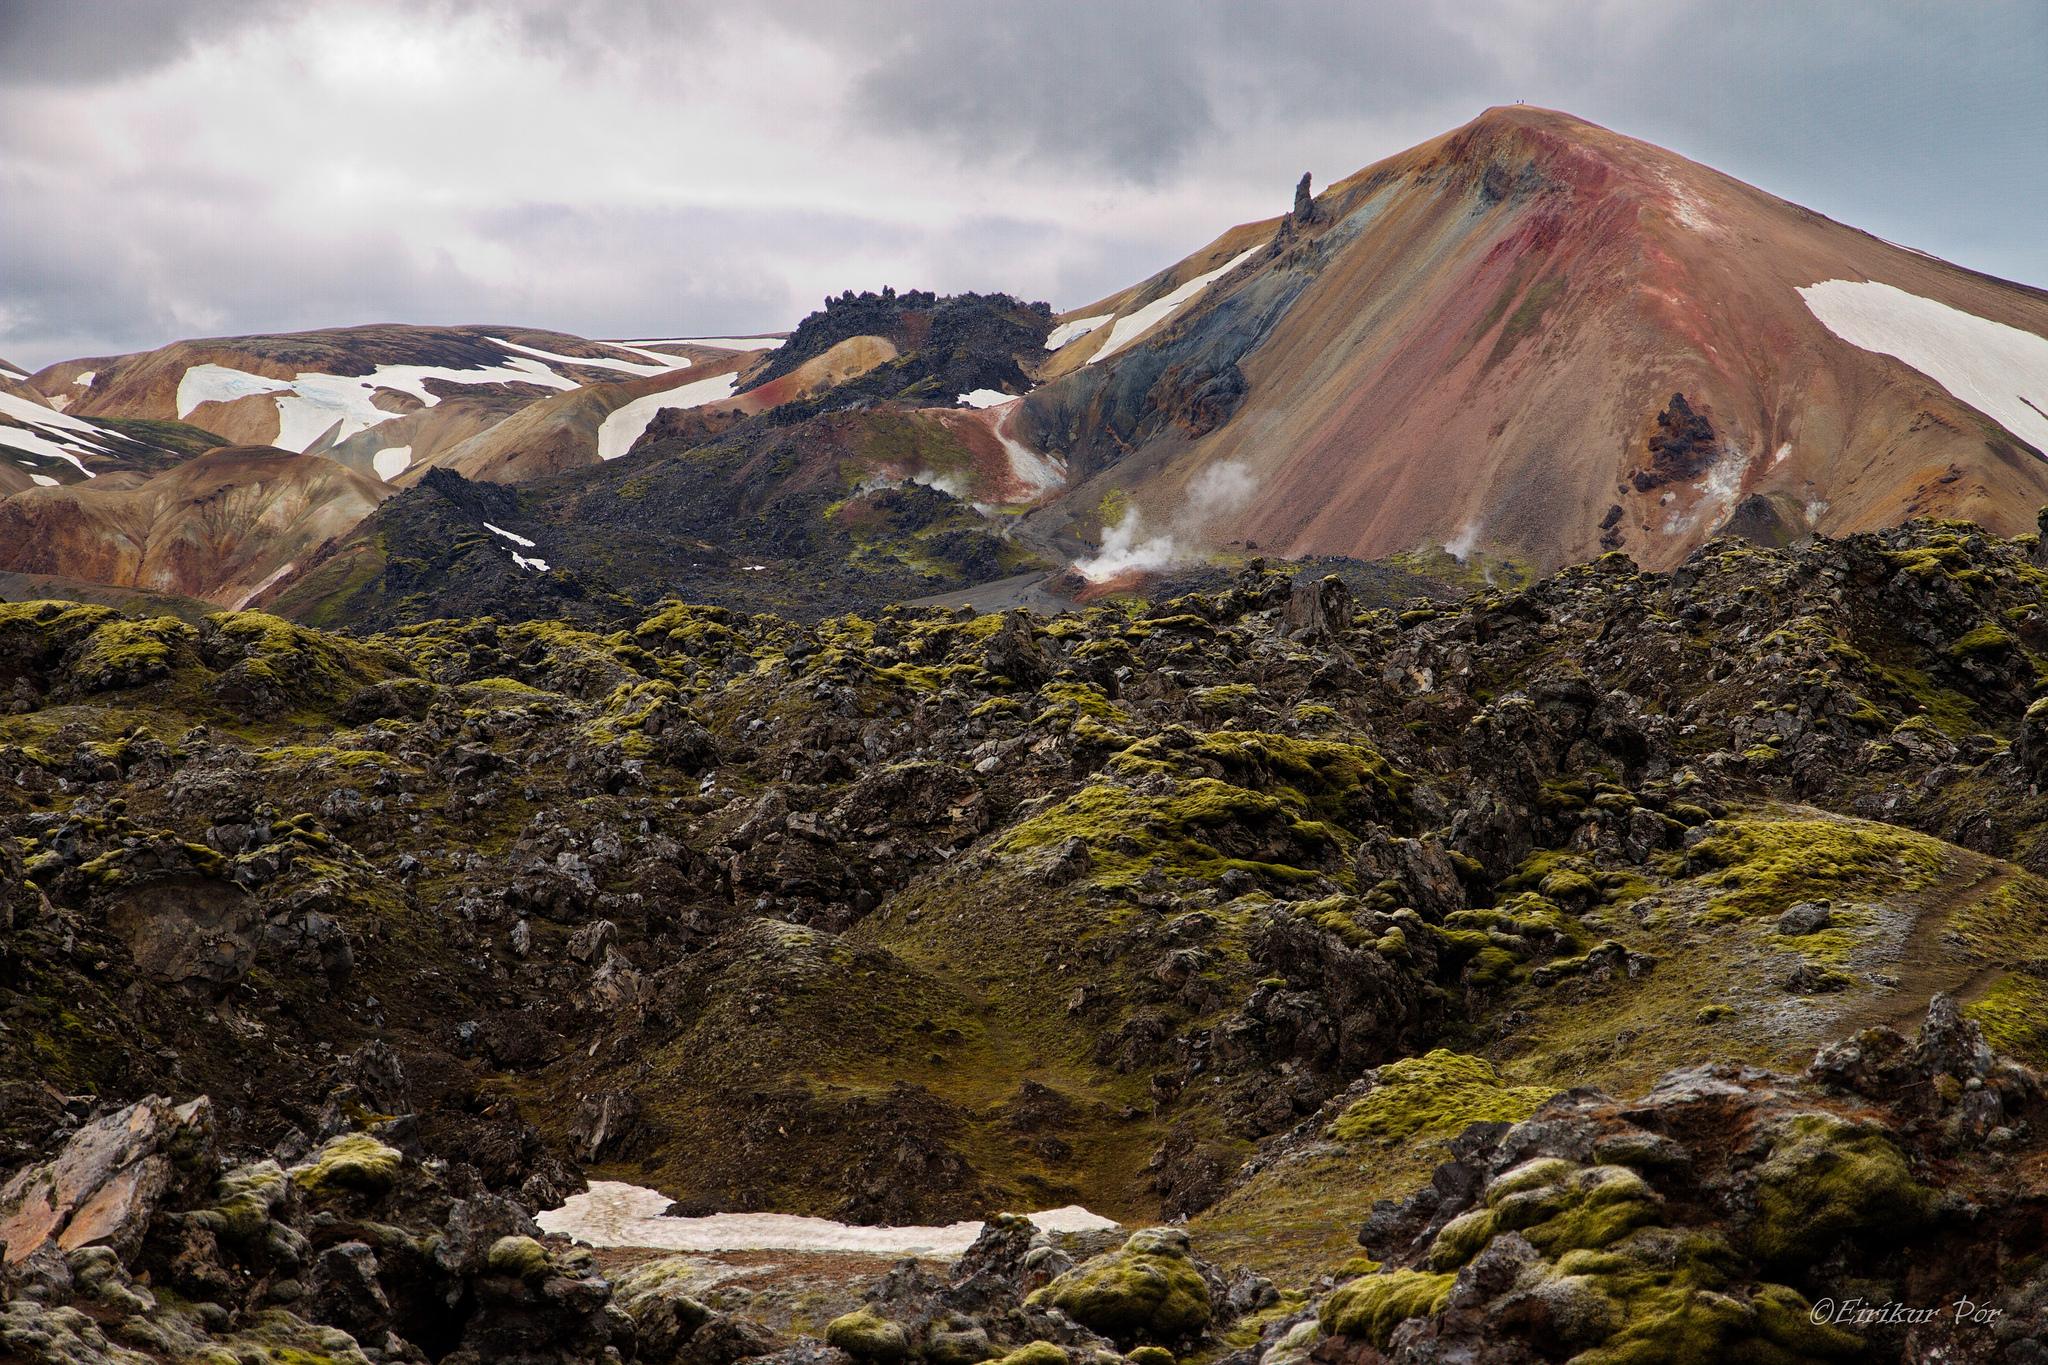 Photo: Eiríkur Þór Einarsson via flickr